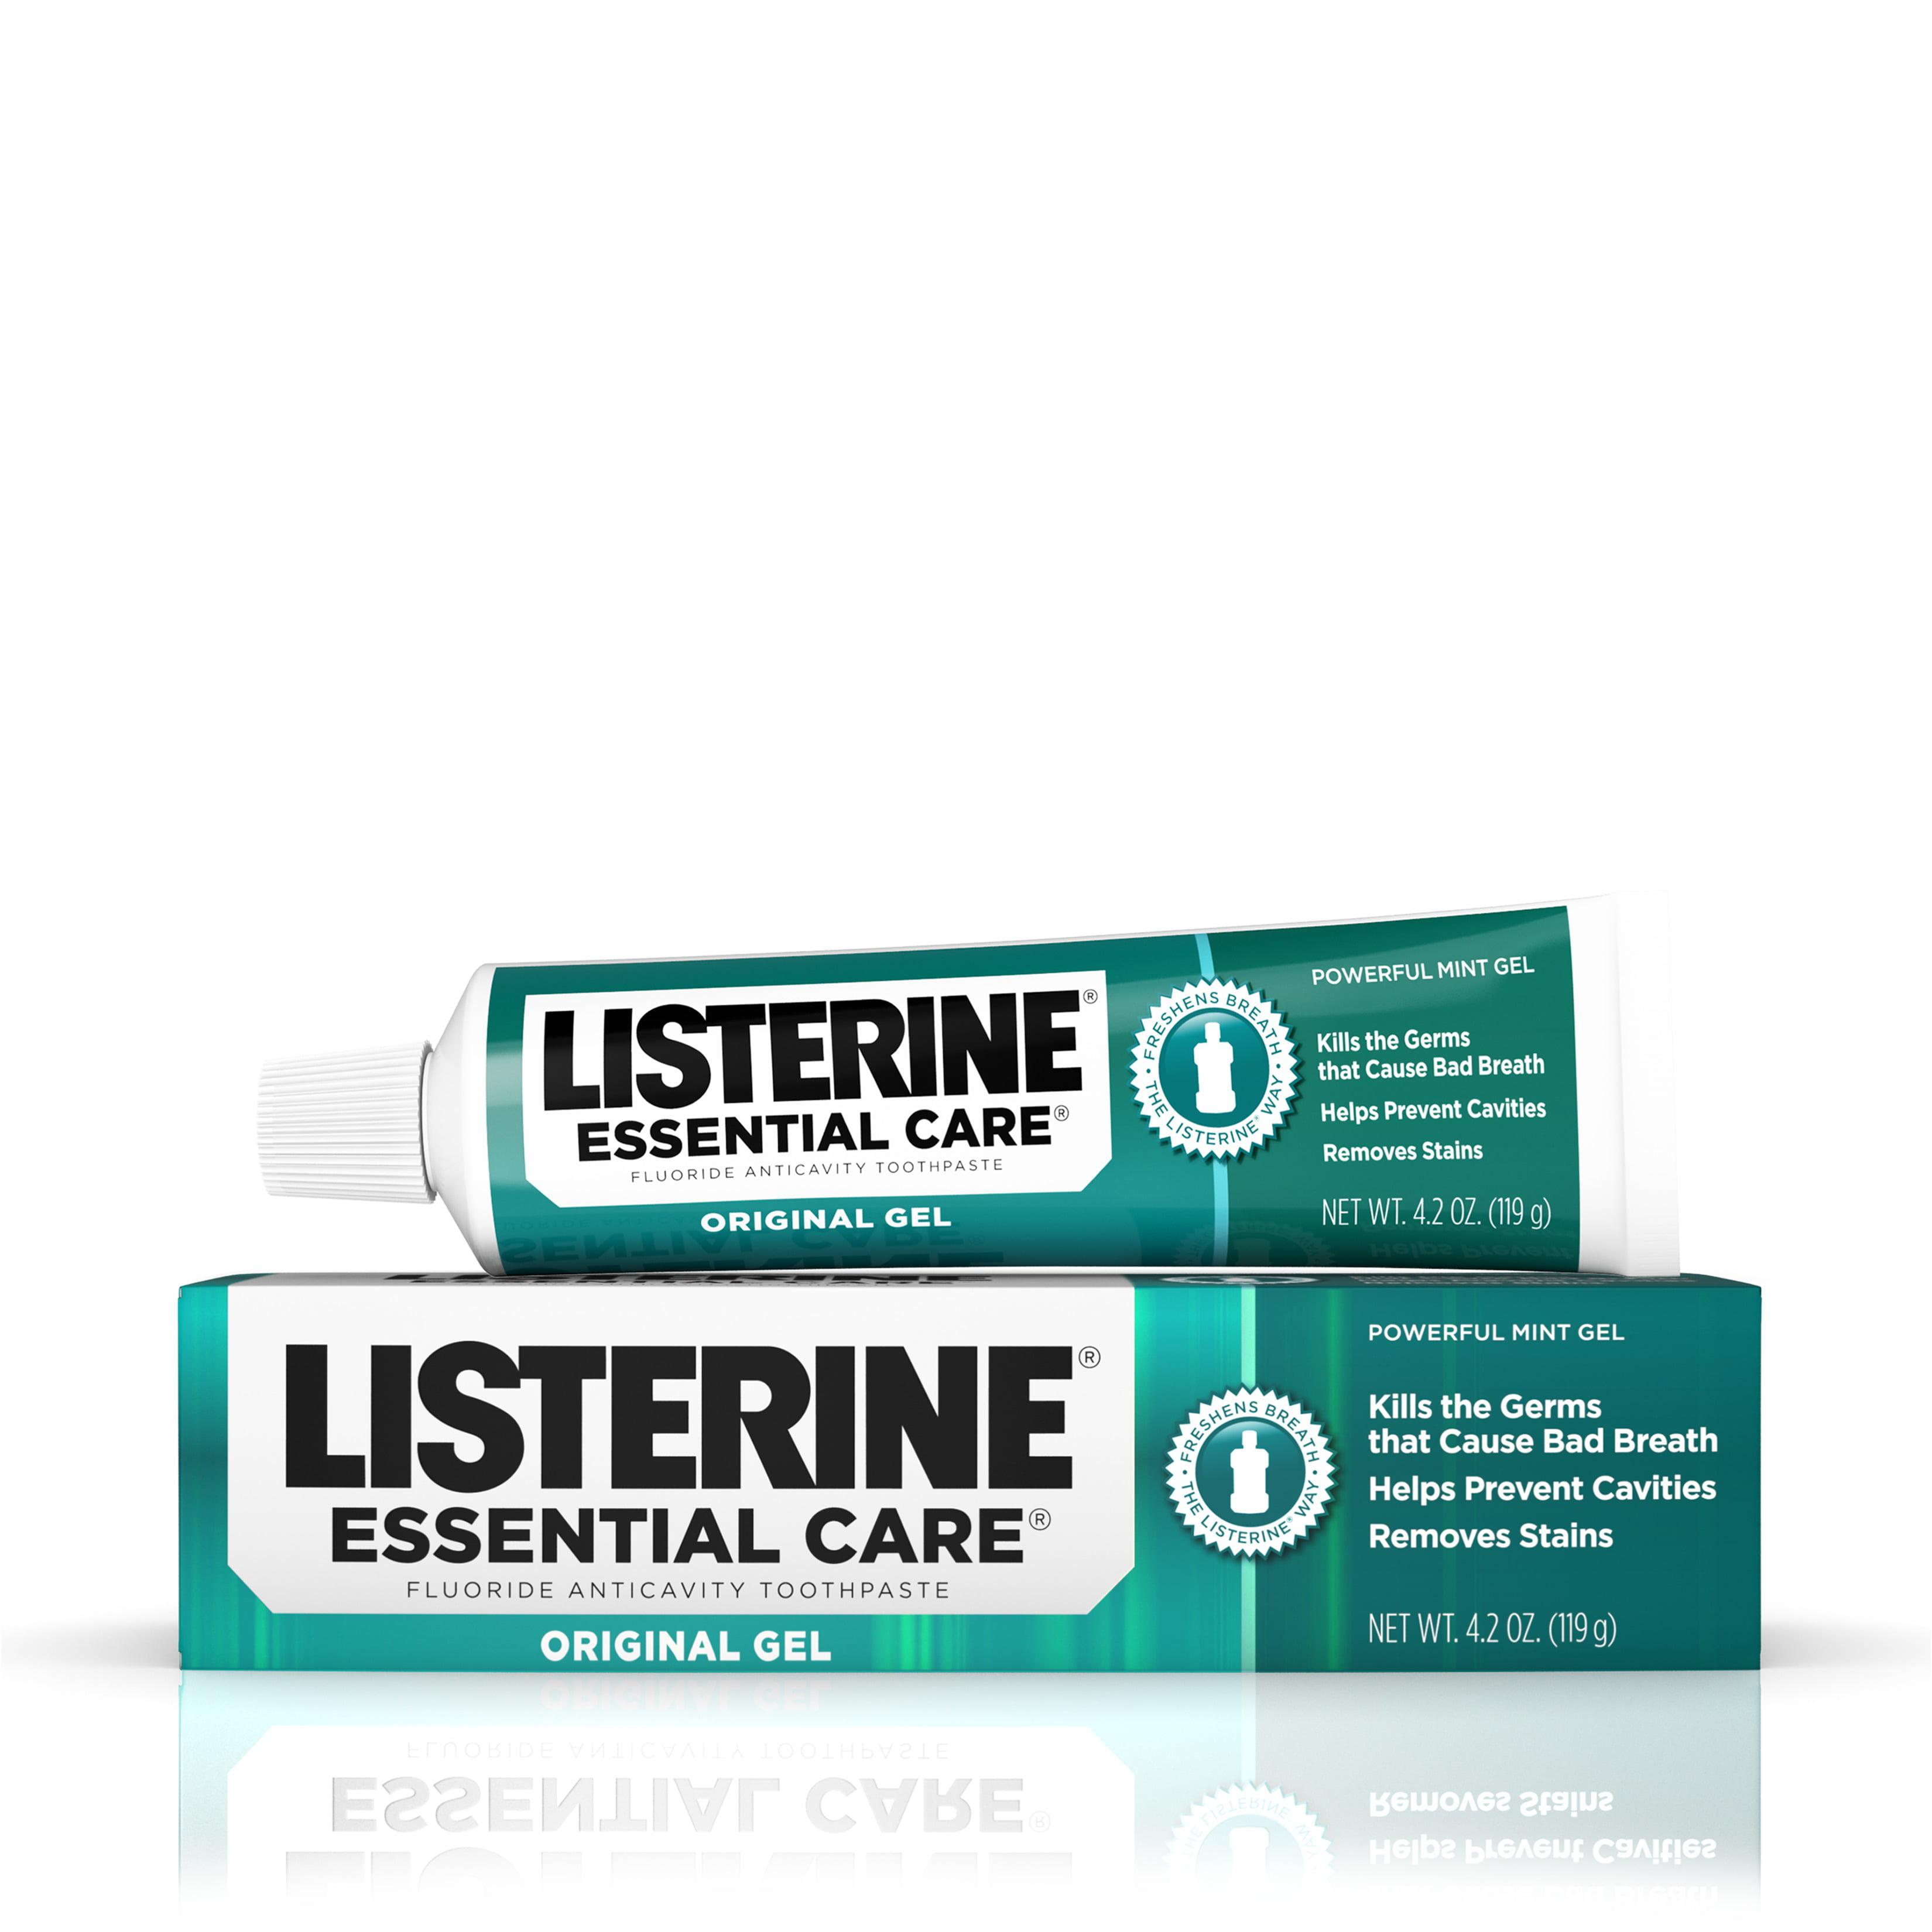 Listerine Essential Care Original Gel Fluoride Toothpaste, 4.2 oz